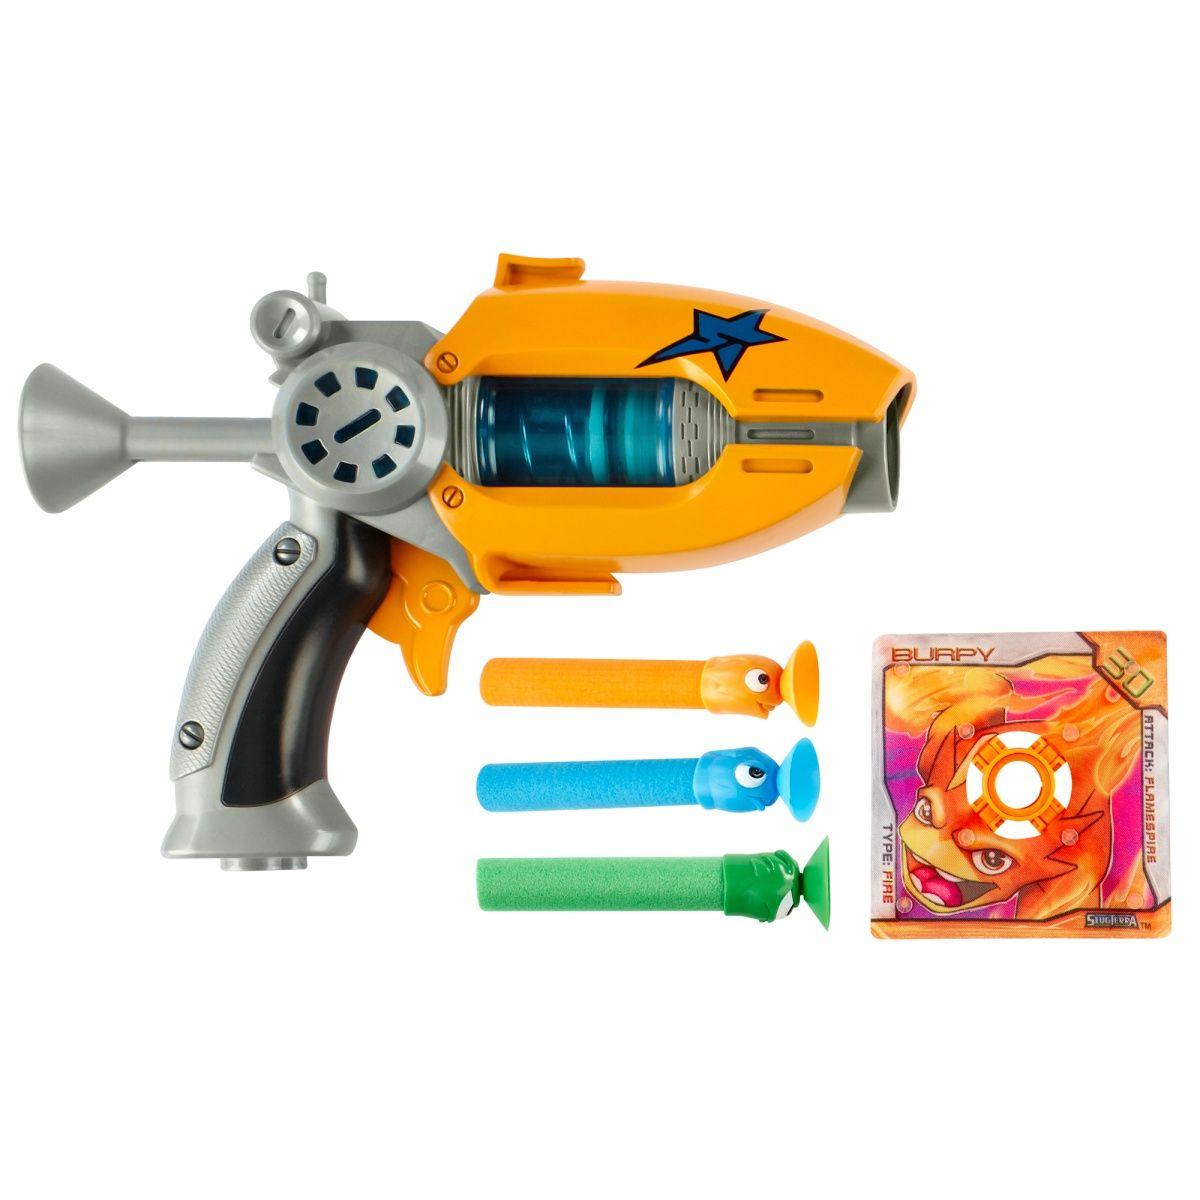 Слагтерра игрушки фото 10 фотография